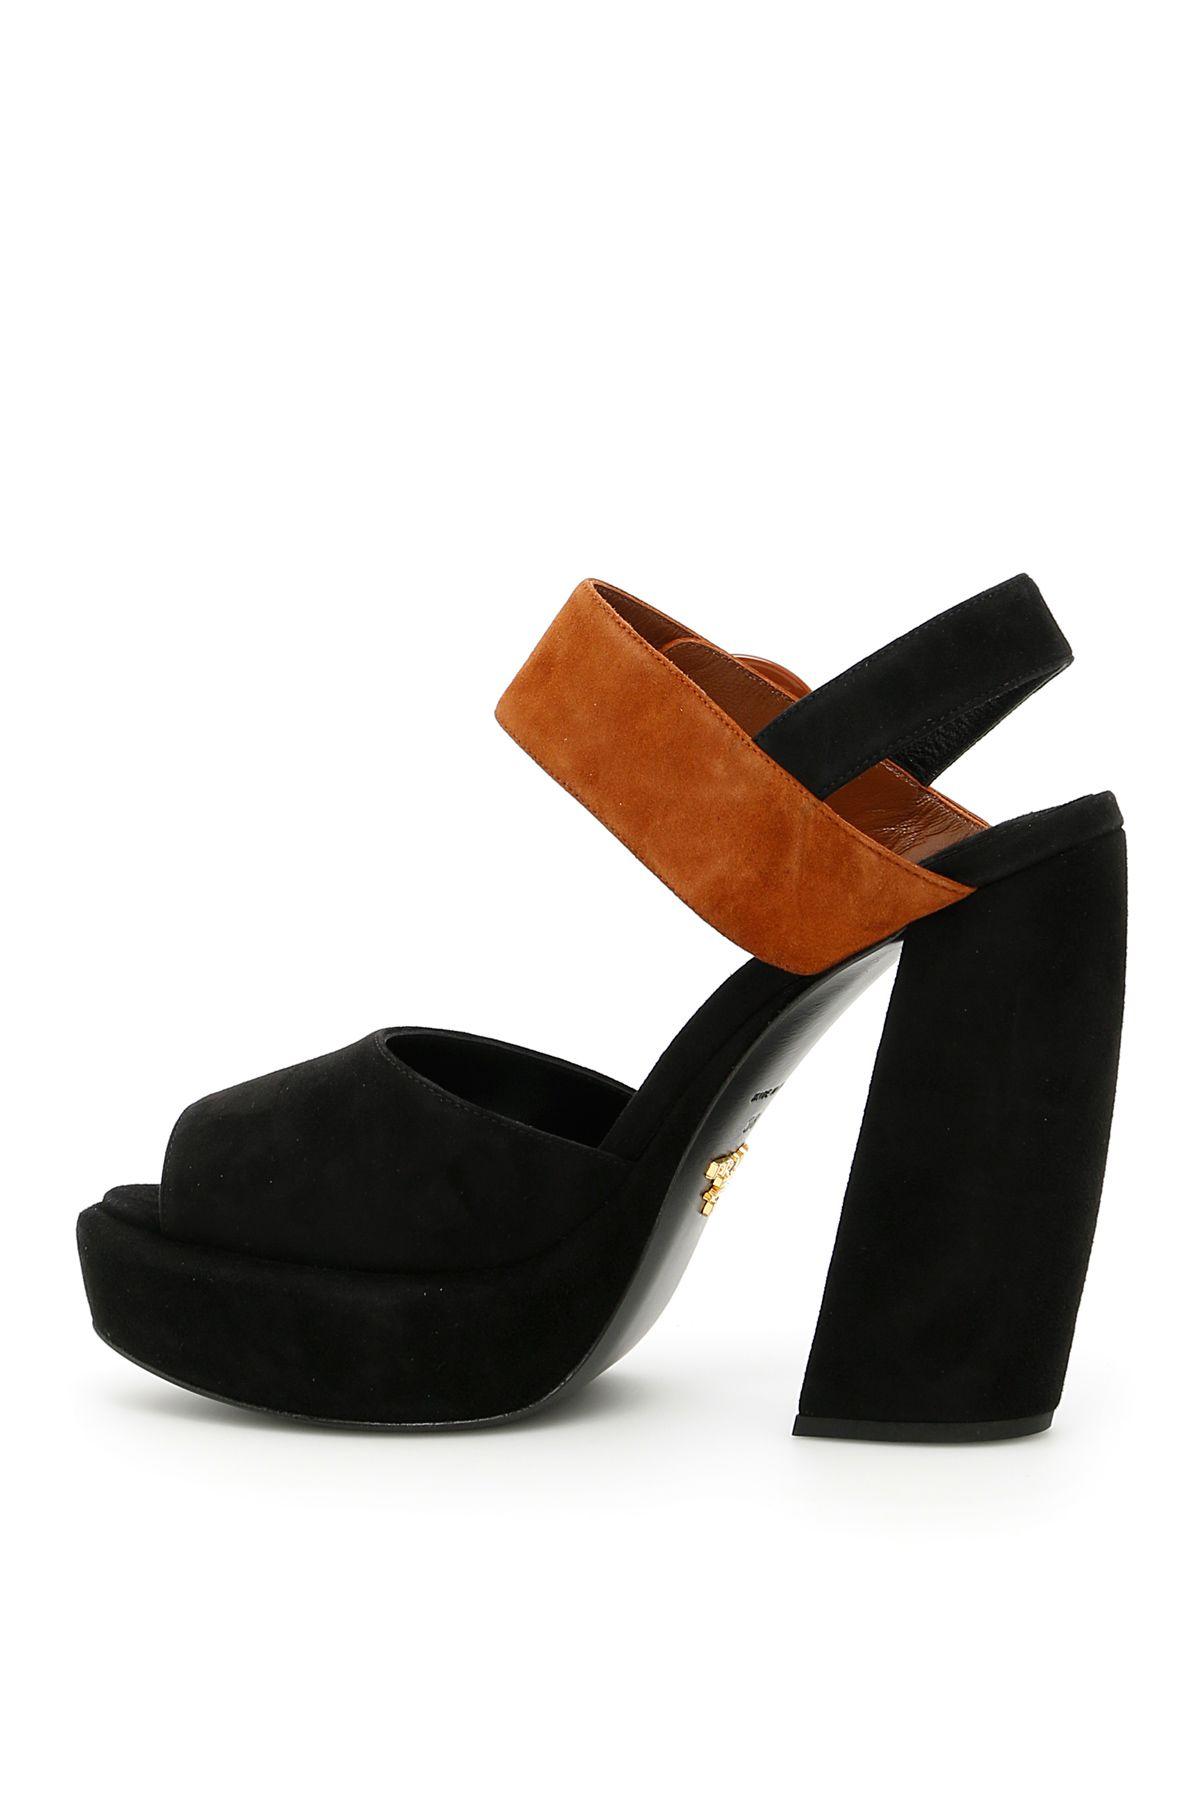 Prada Bicolor Suede Sandals Exclusive Cheap Price Discount Very Cheap Sale Pre Order Clearance Latest WXp9FfHvBl